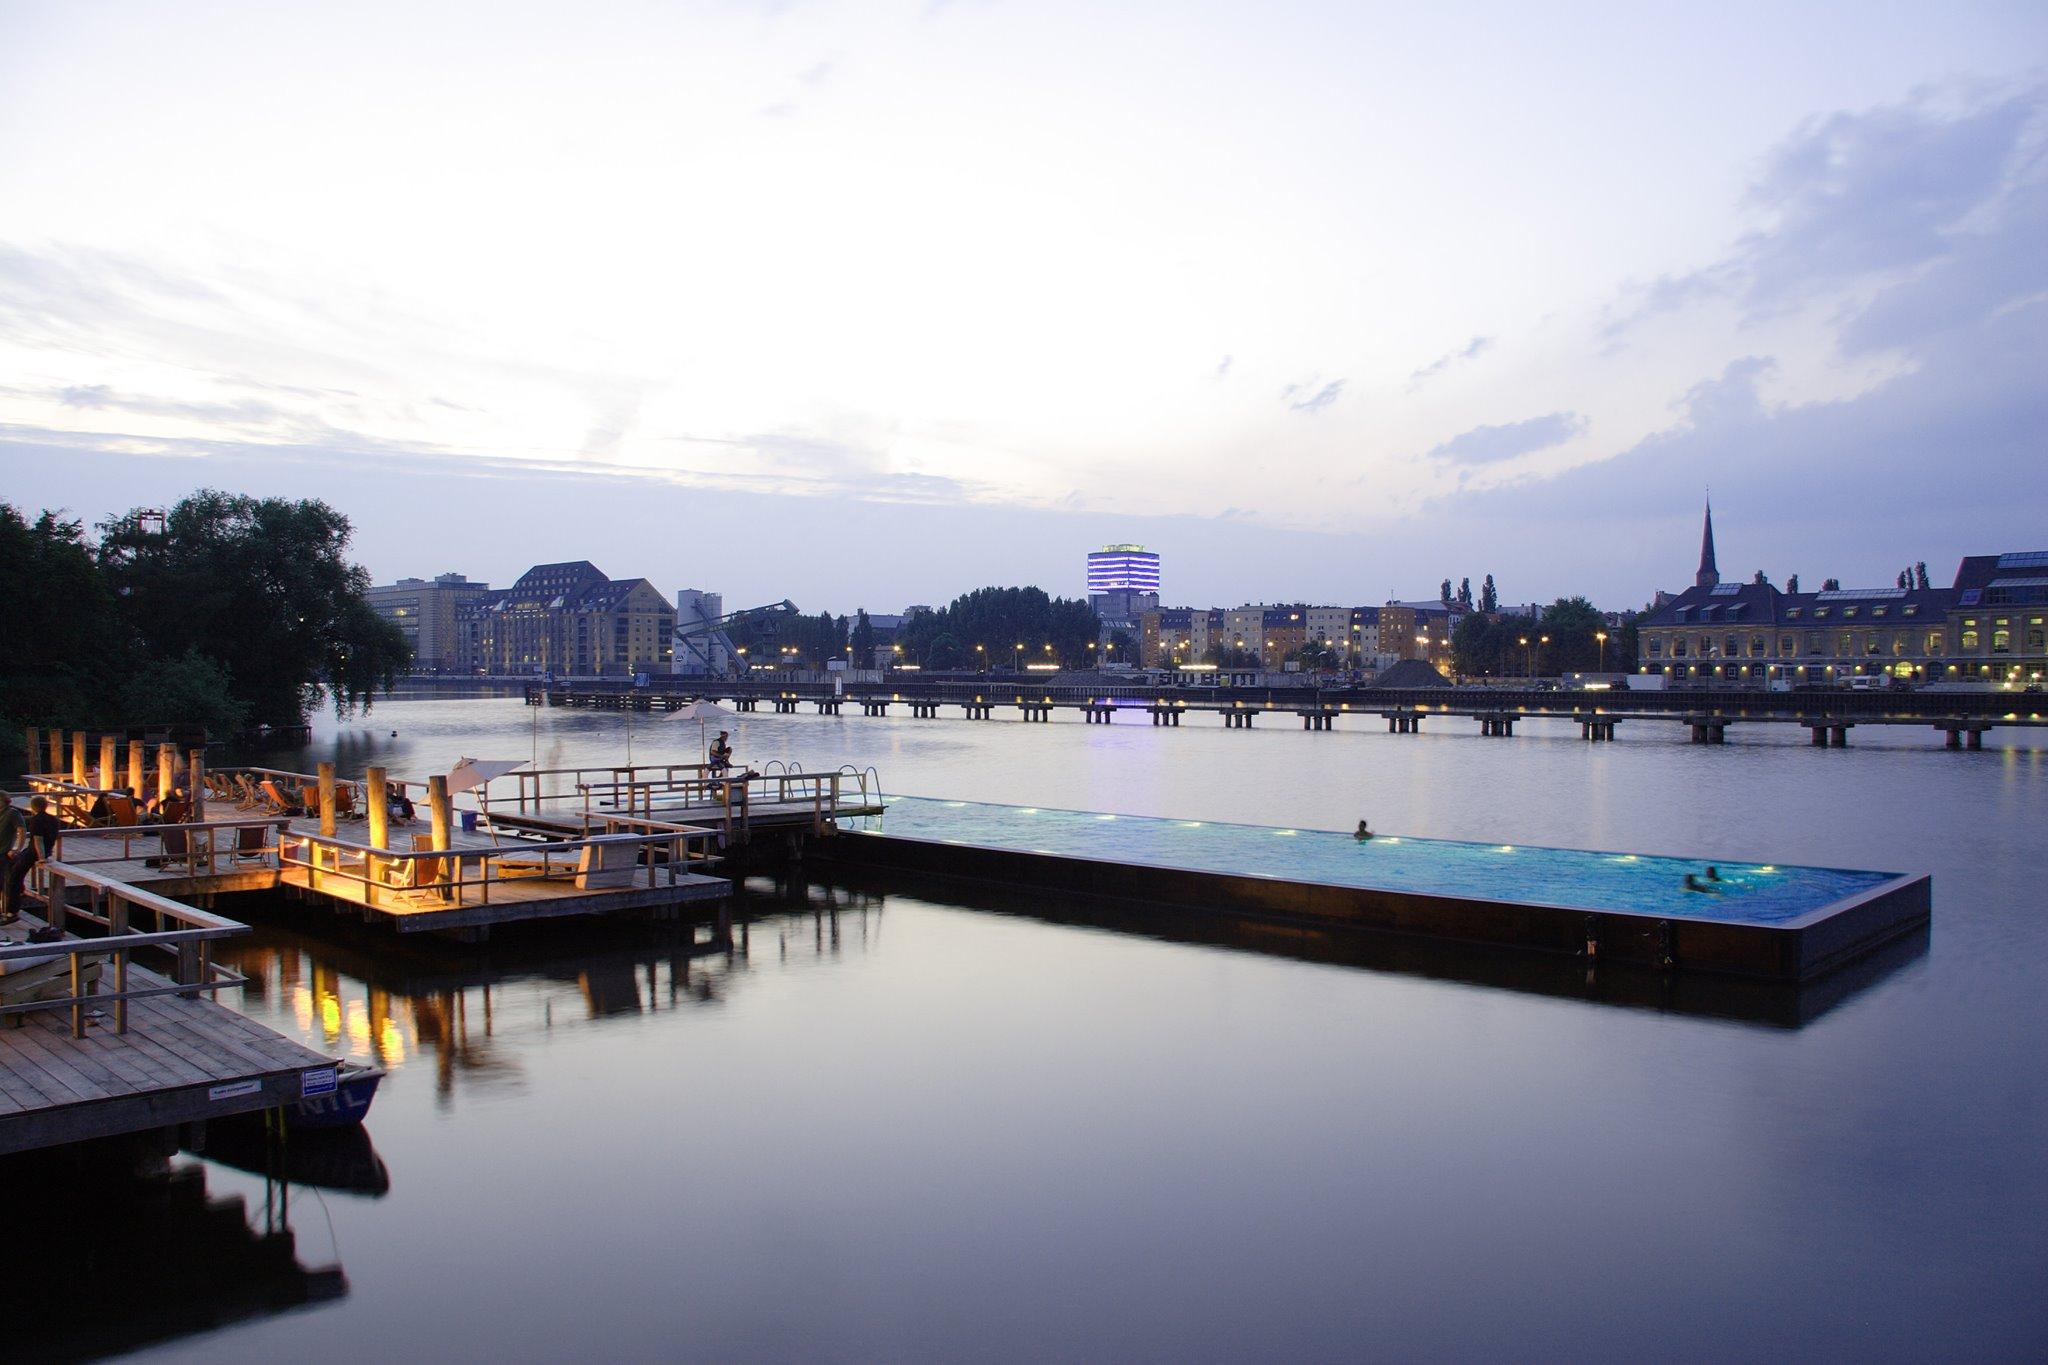 Badeschiff Berlin – Spree